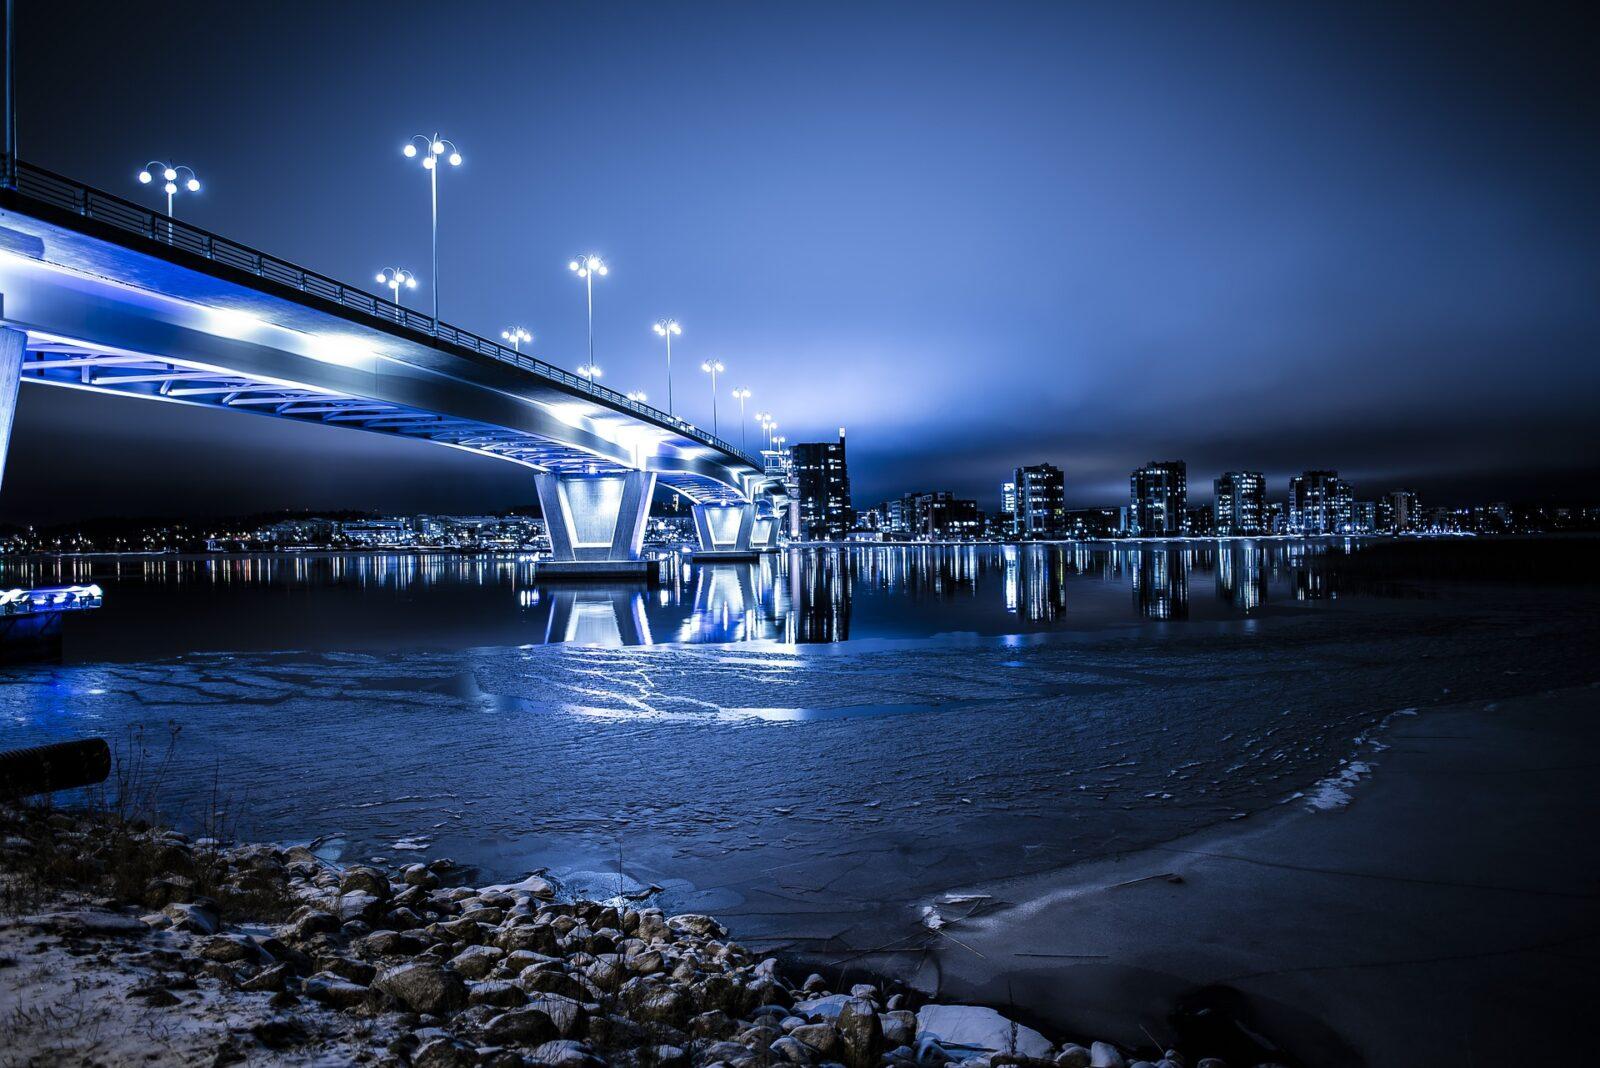 photo of bridge and city skyline at night